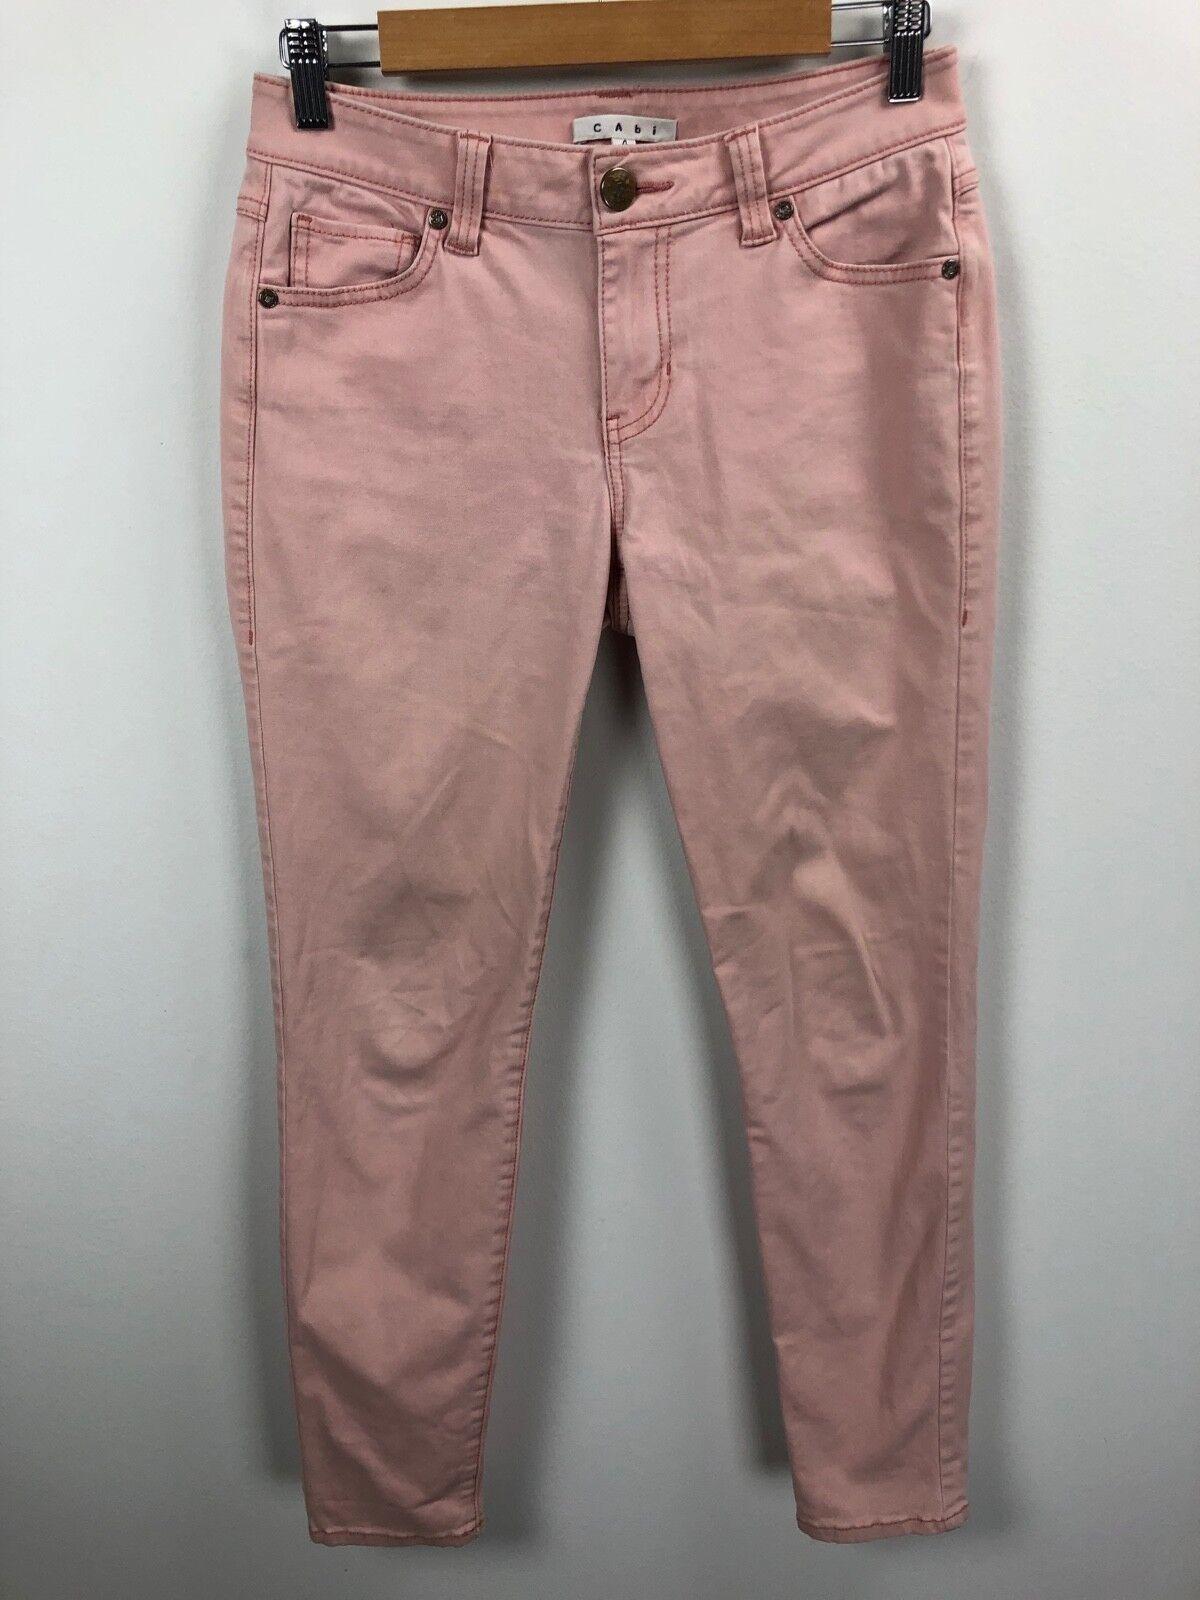 CAbi Pink Skinny Jeans Size 4